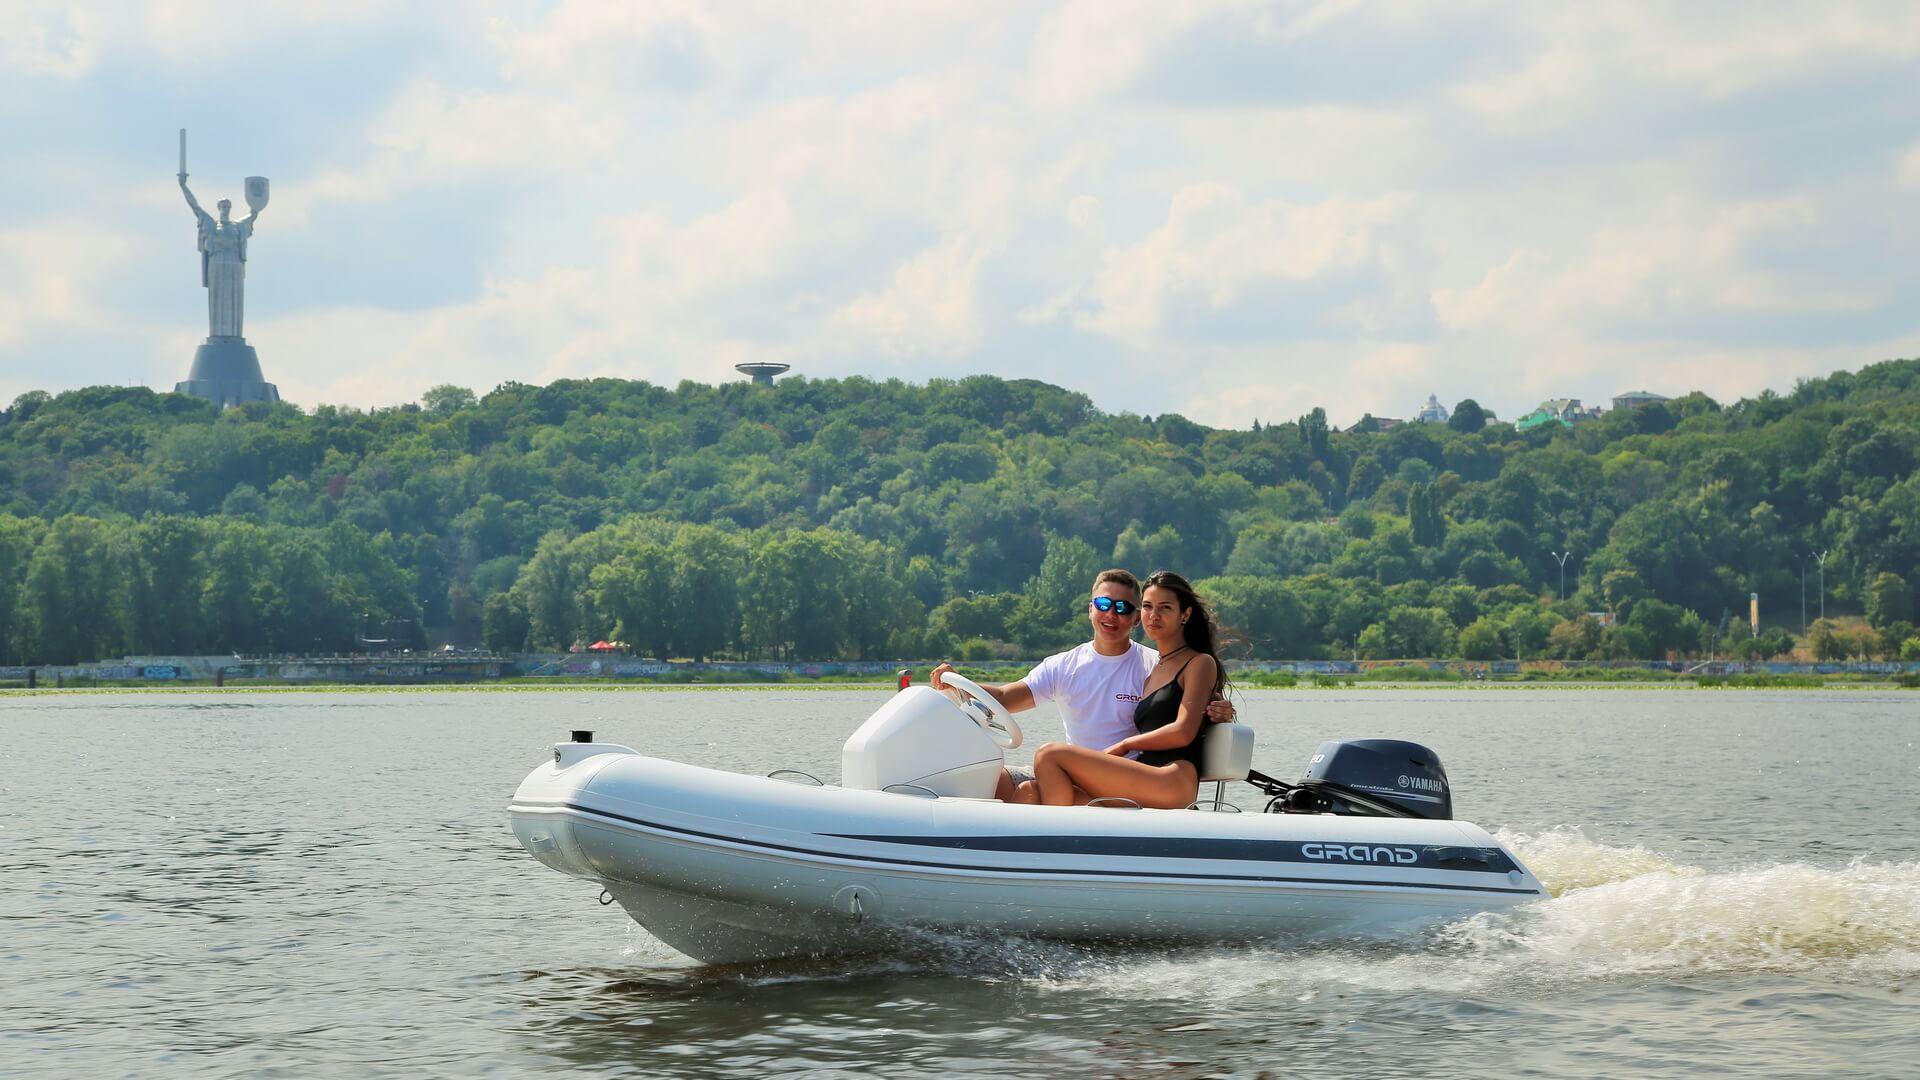 Надувная лодка с жестким дном GRAND Silver Line S330L,Надувная лодка GRAND Silver Line S330L, GRAND Silver Line S330L, GRAND Silver Line S330LF, GRAND S330L, GRAND S330LF, GRAND S330, Надувная лодка GRAND, Надувная лодка ГРАНД, Надувная лодка с жестким дном, RIB, Rigid Inflatable Boats